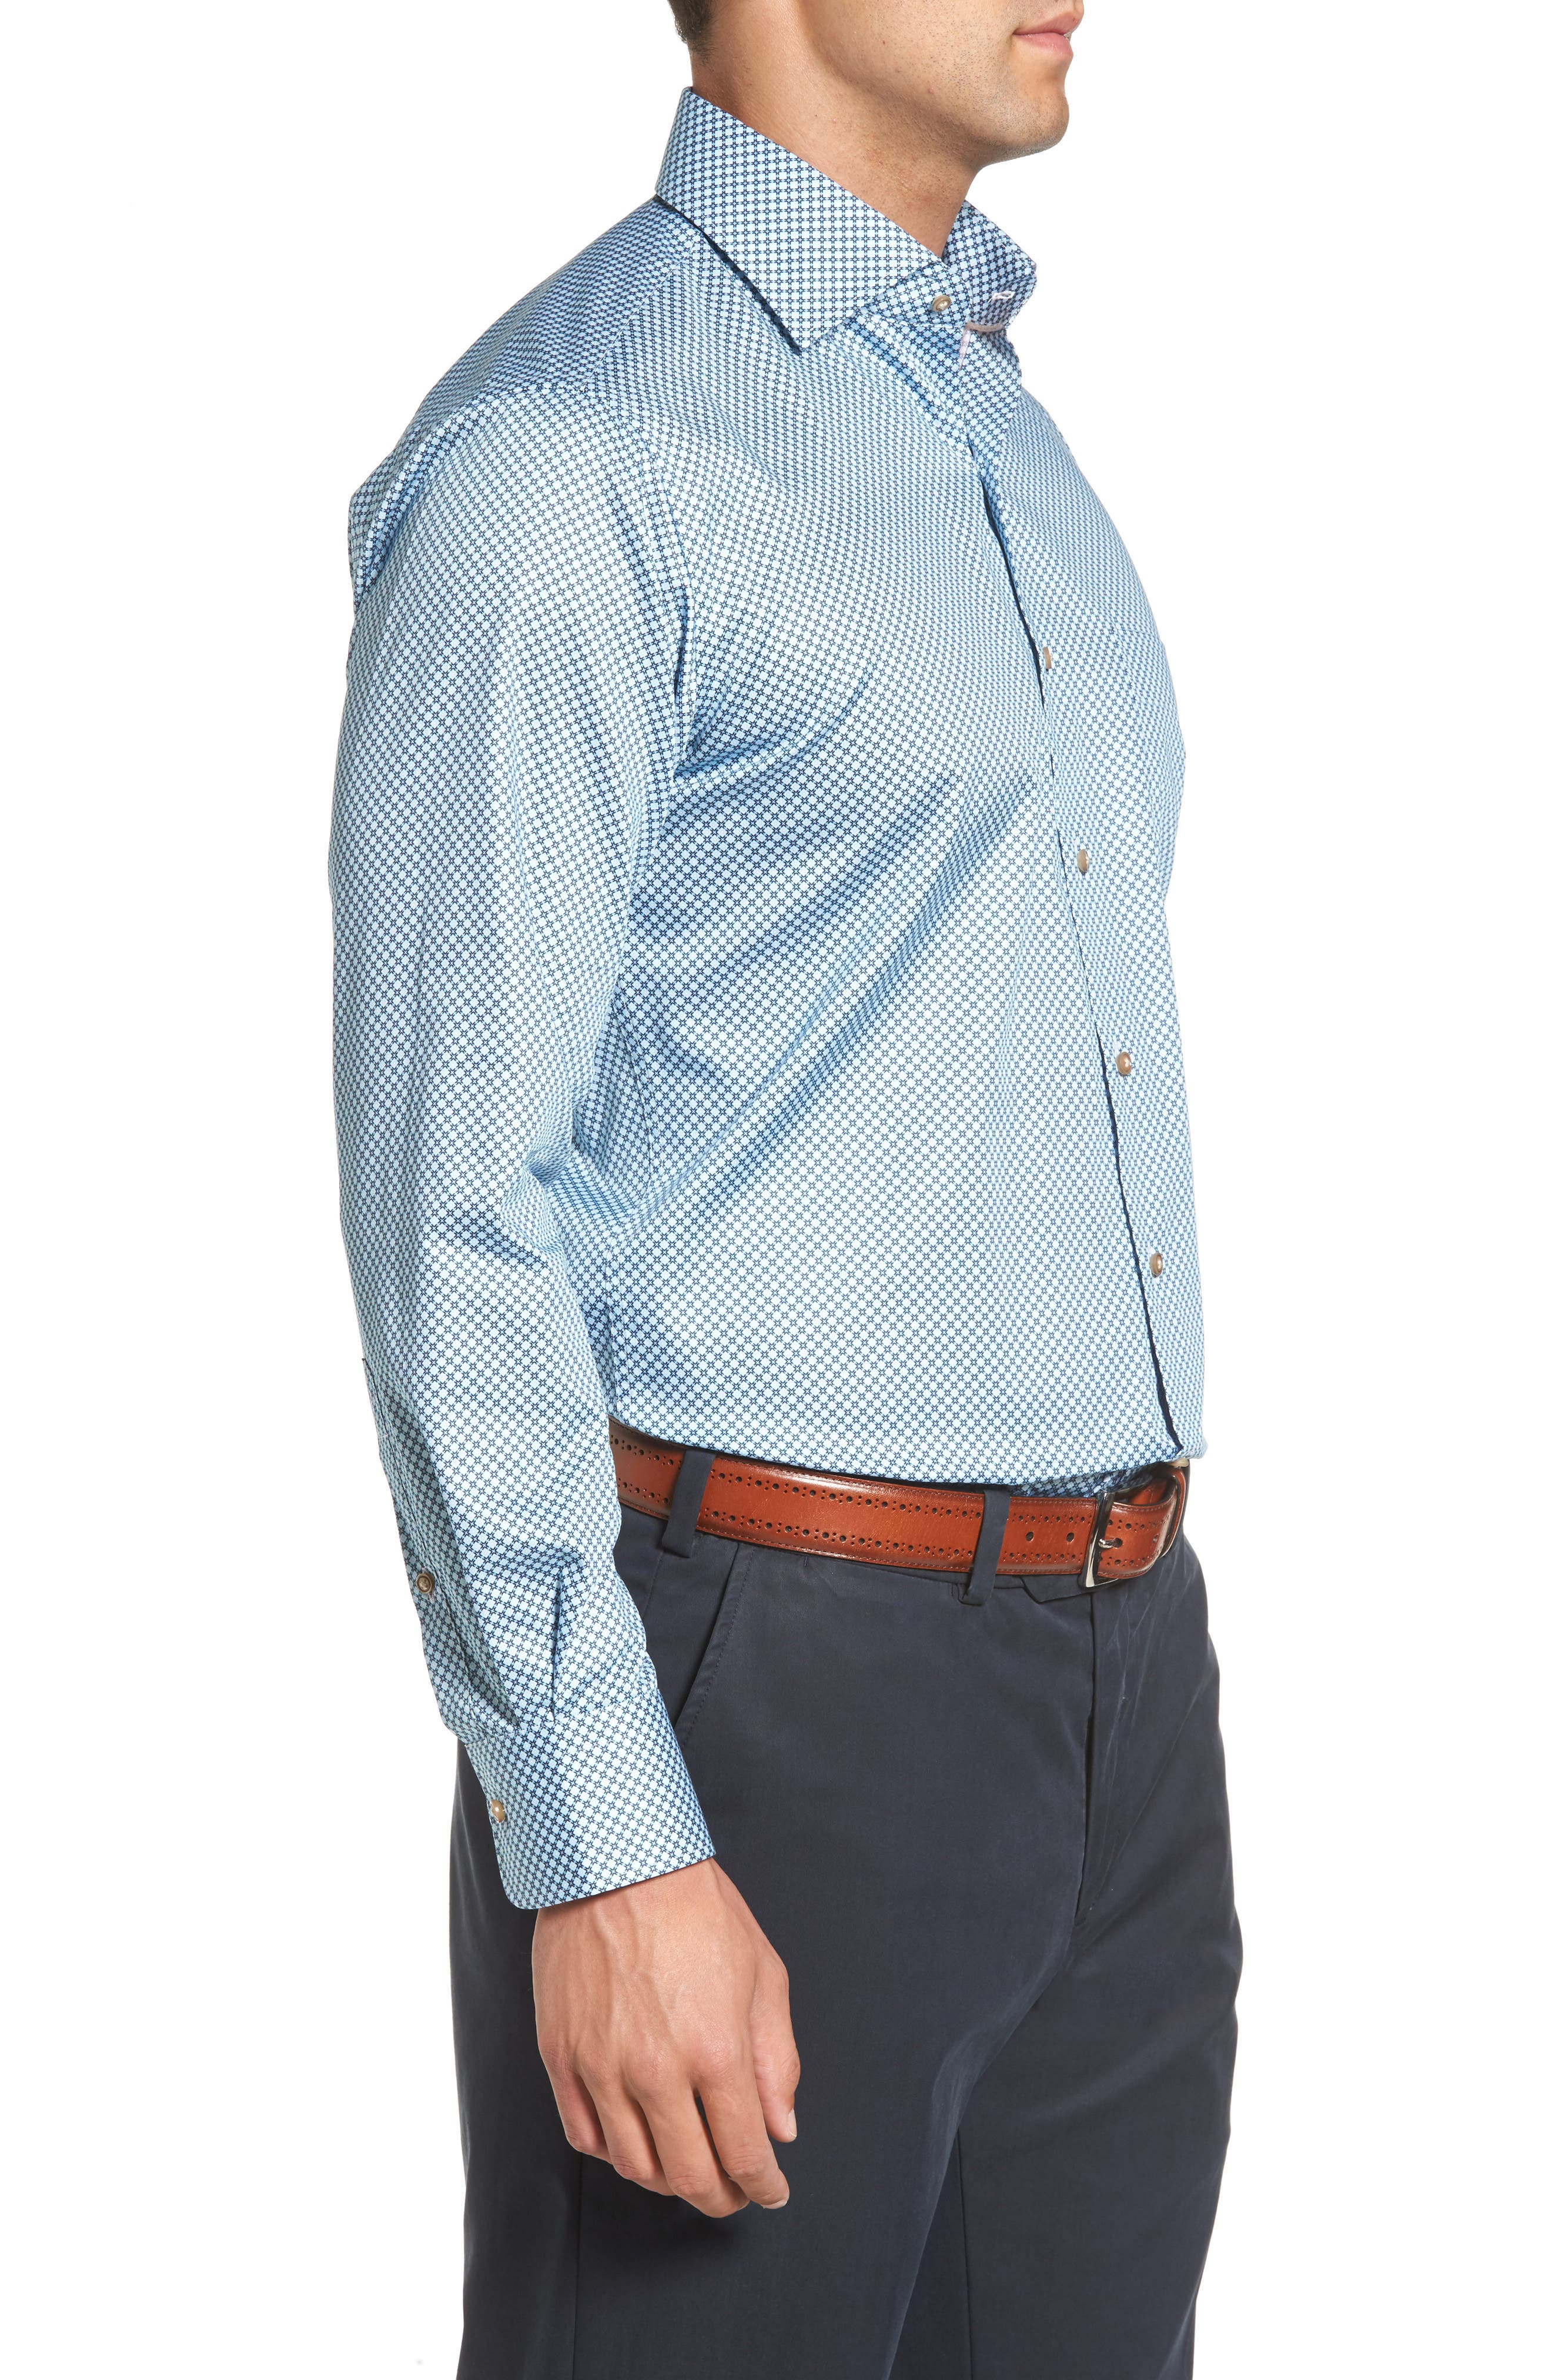 Pandora's Box Regular Fit Sport Shirt,                             Alternate thumbnail 3, color,                             437